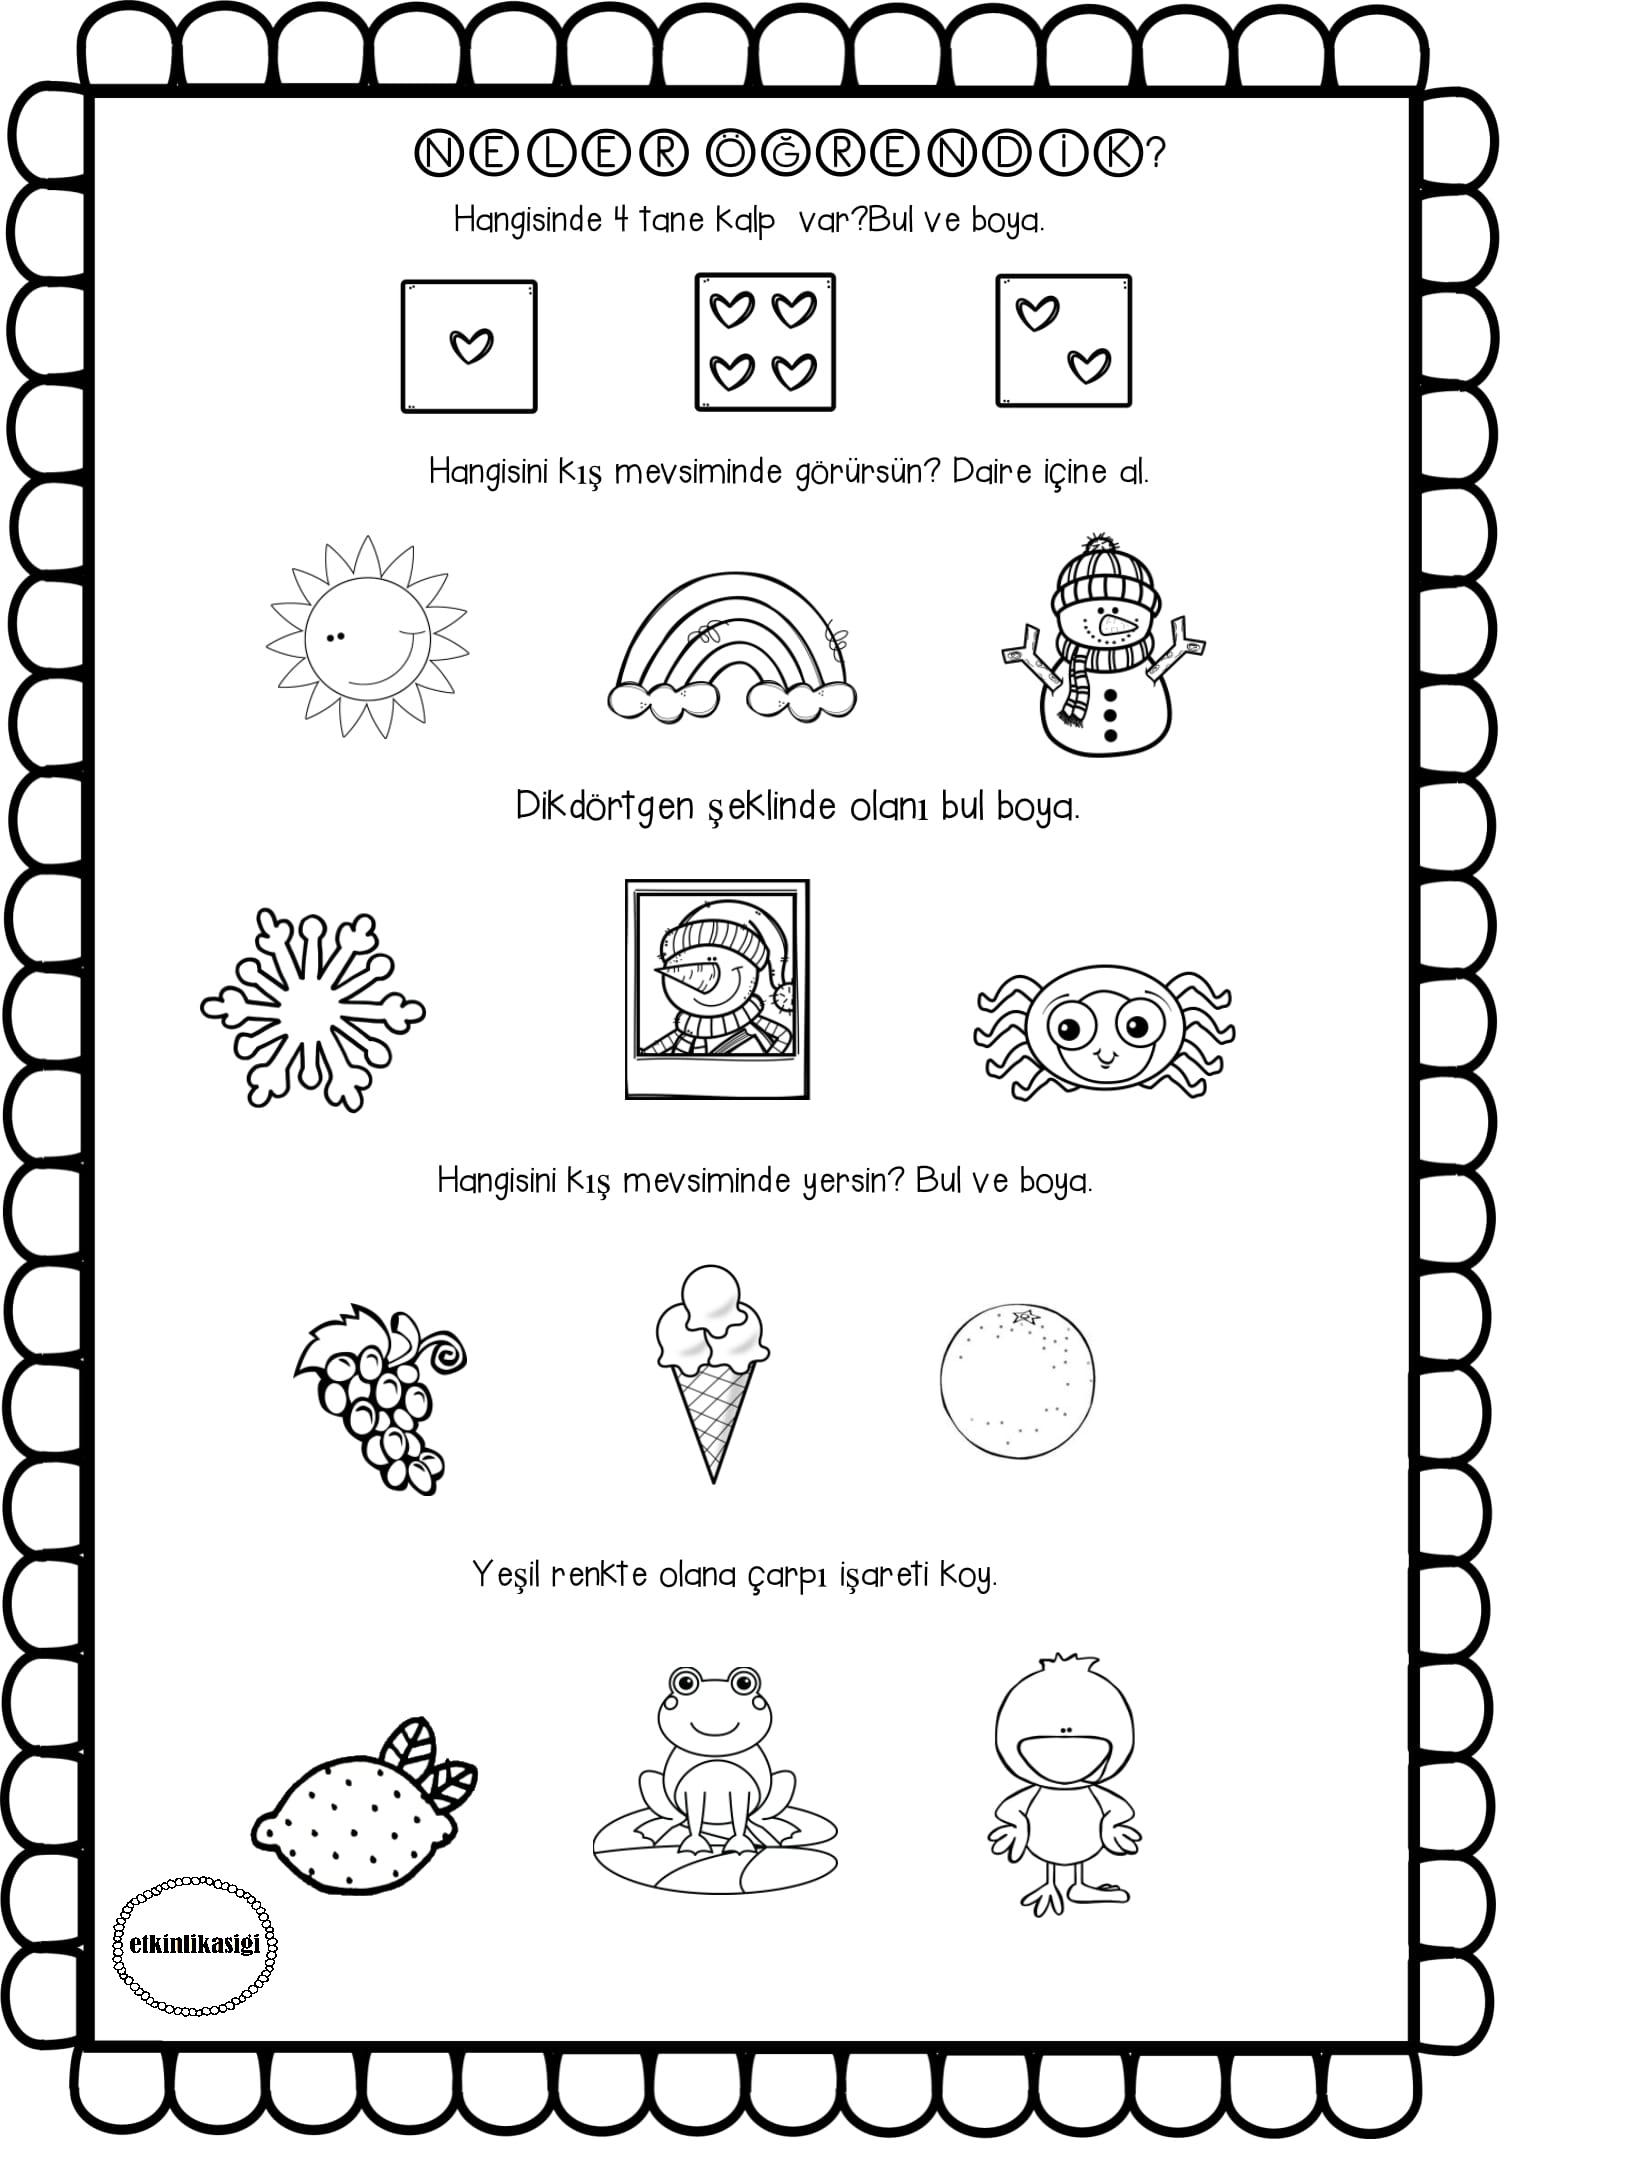 Genel Tekrar Etkinlikasigi Working Pages Pinterest Education